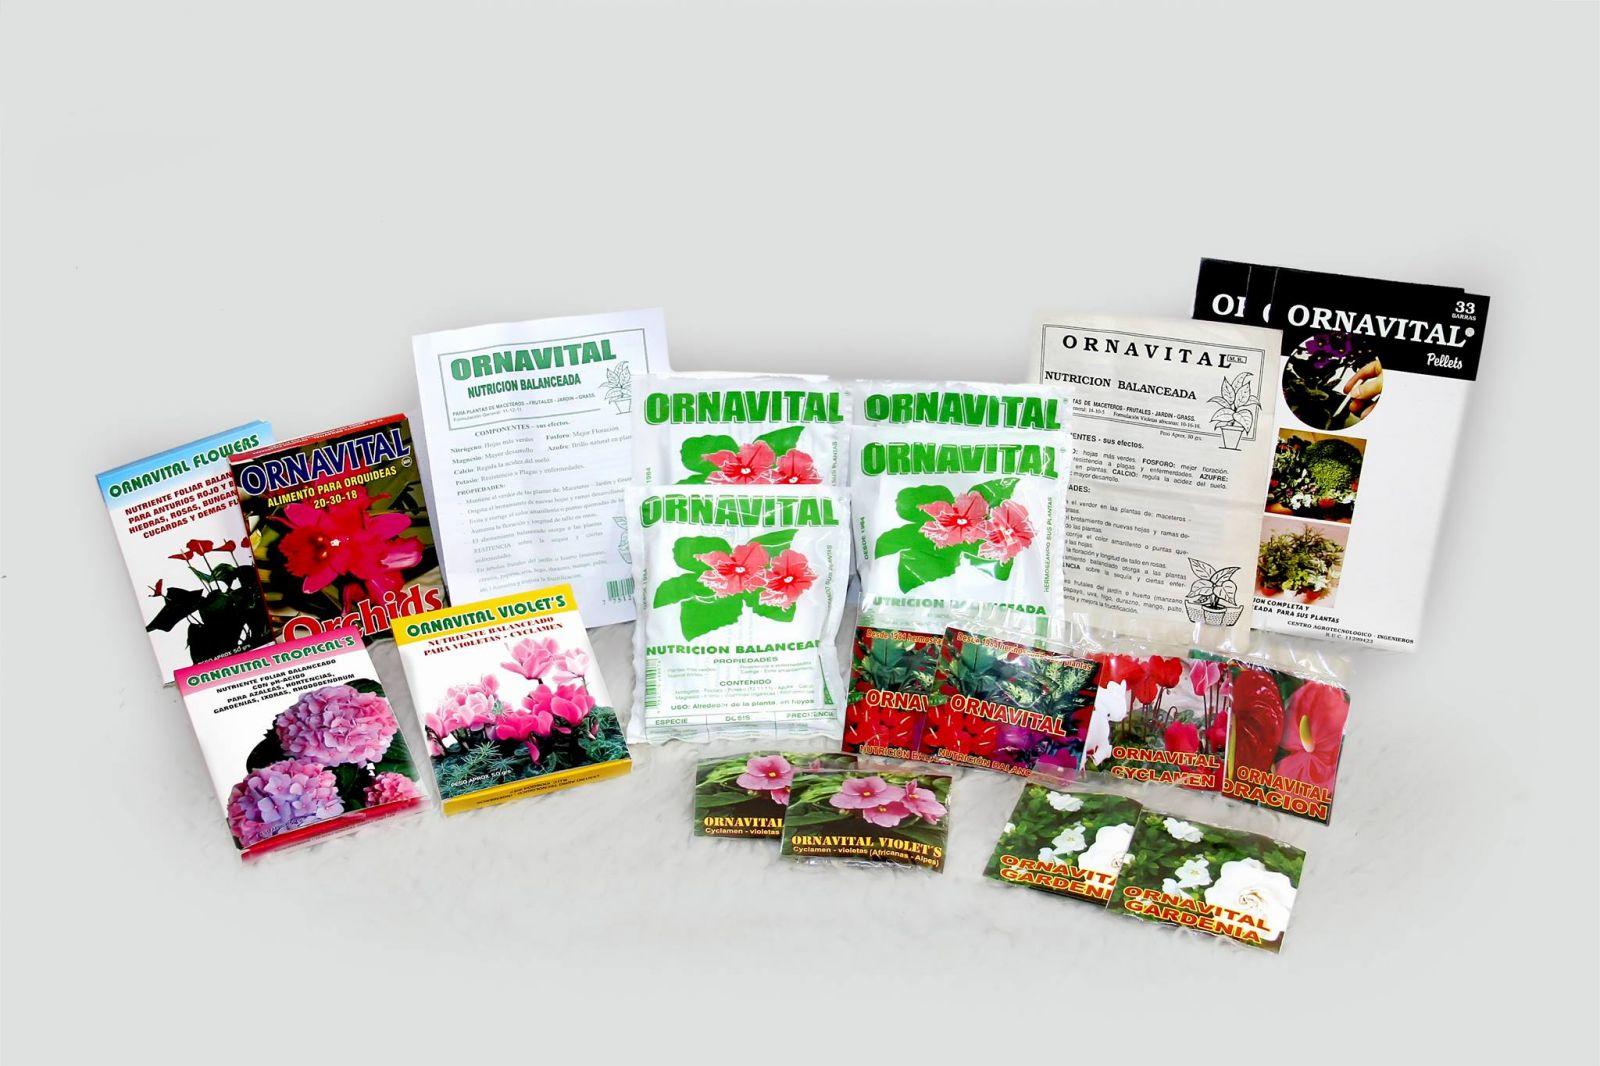 productos de fertilizantes